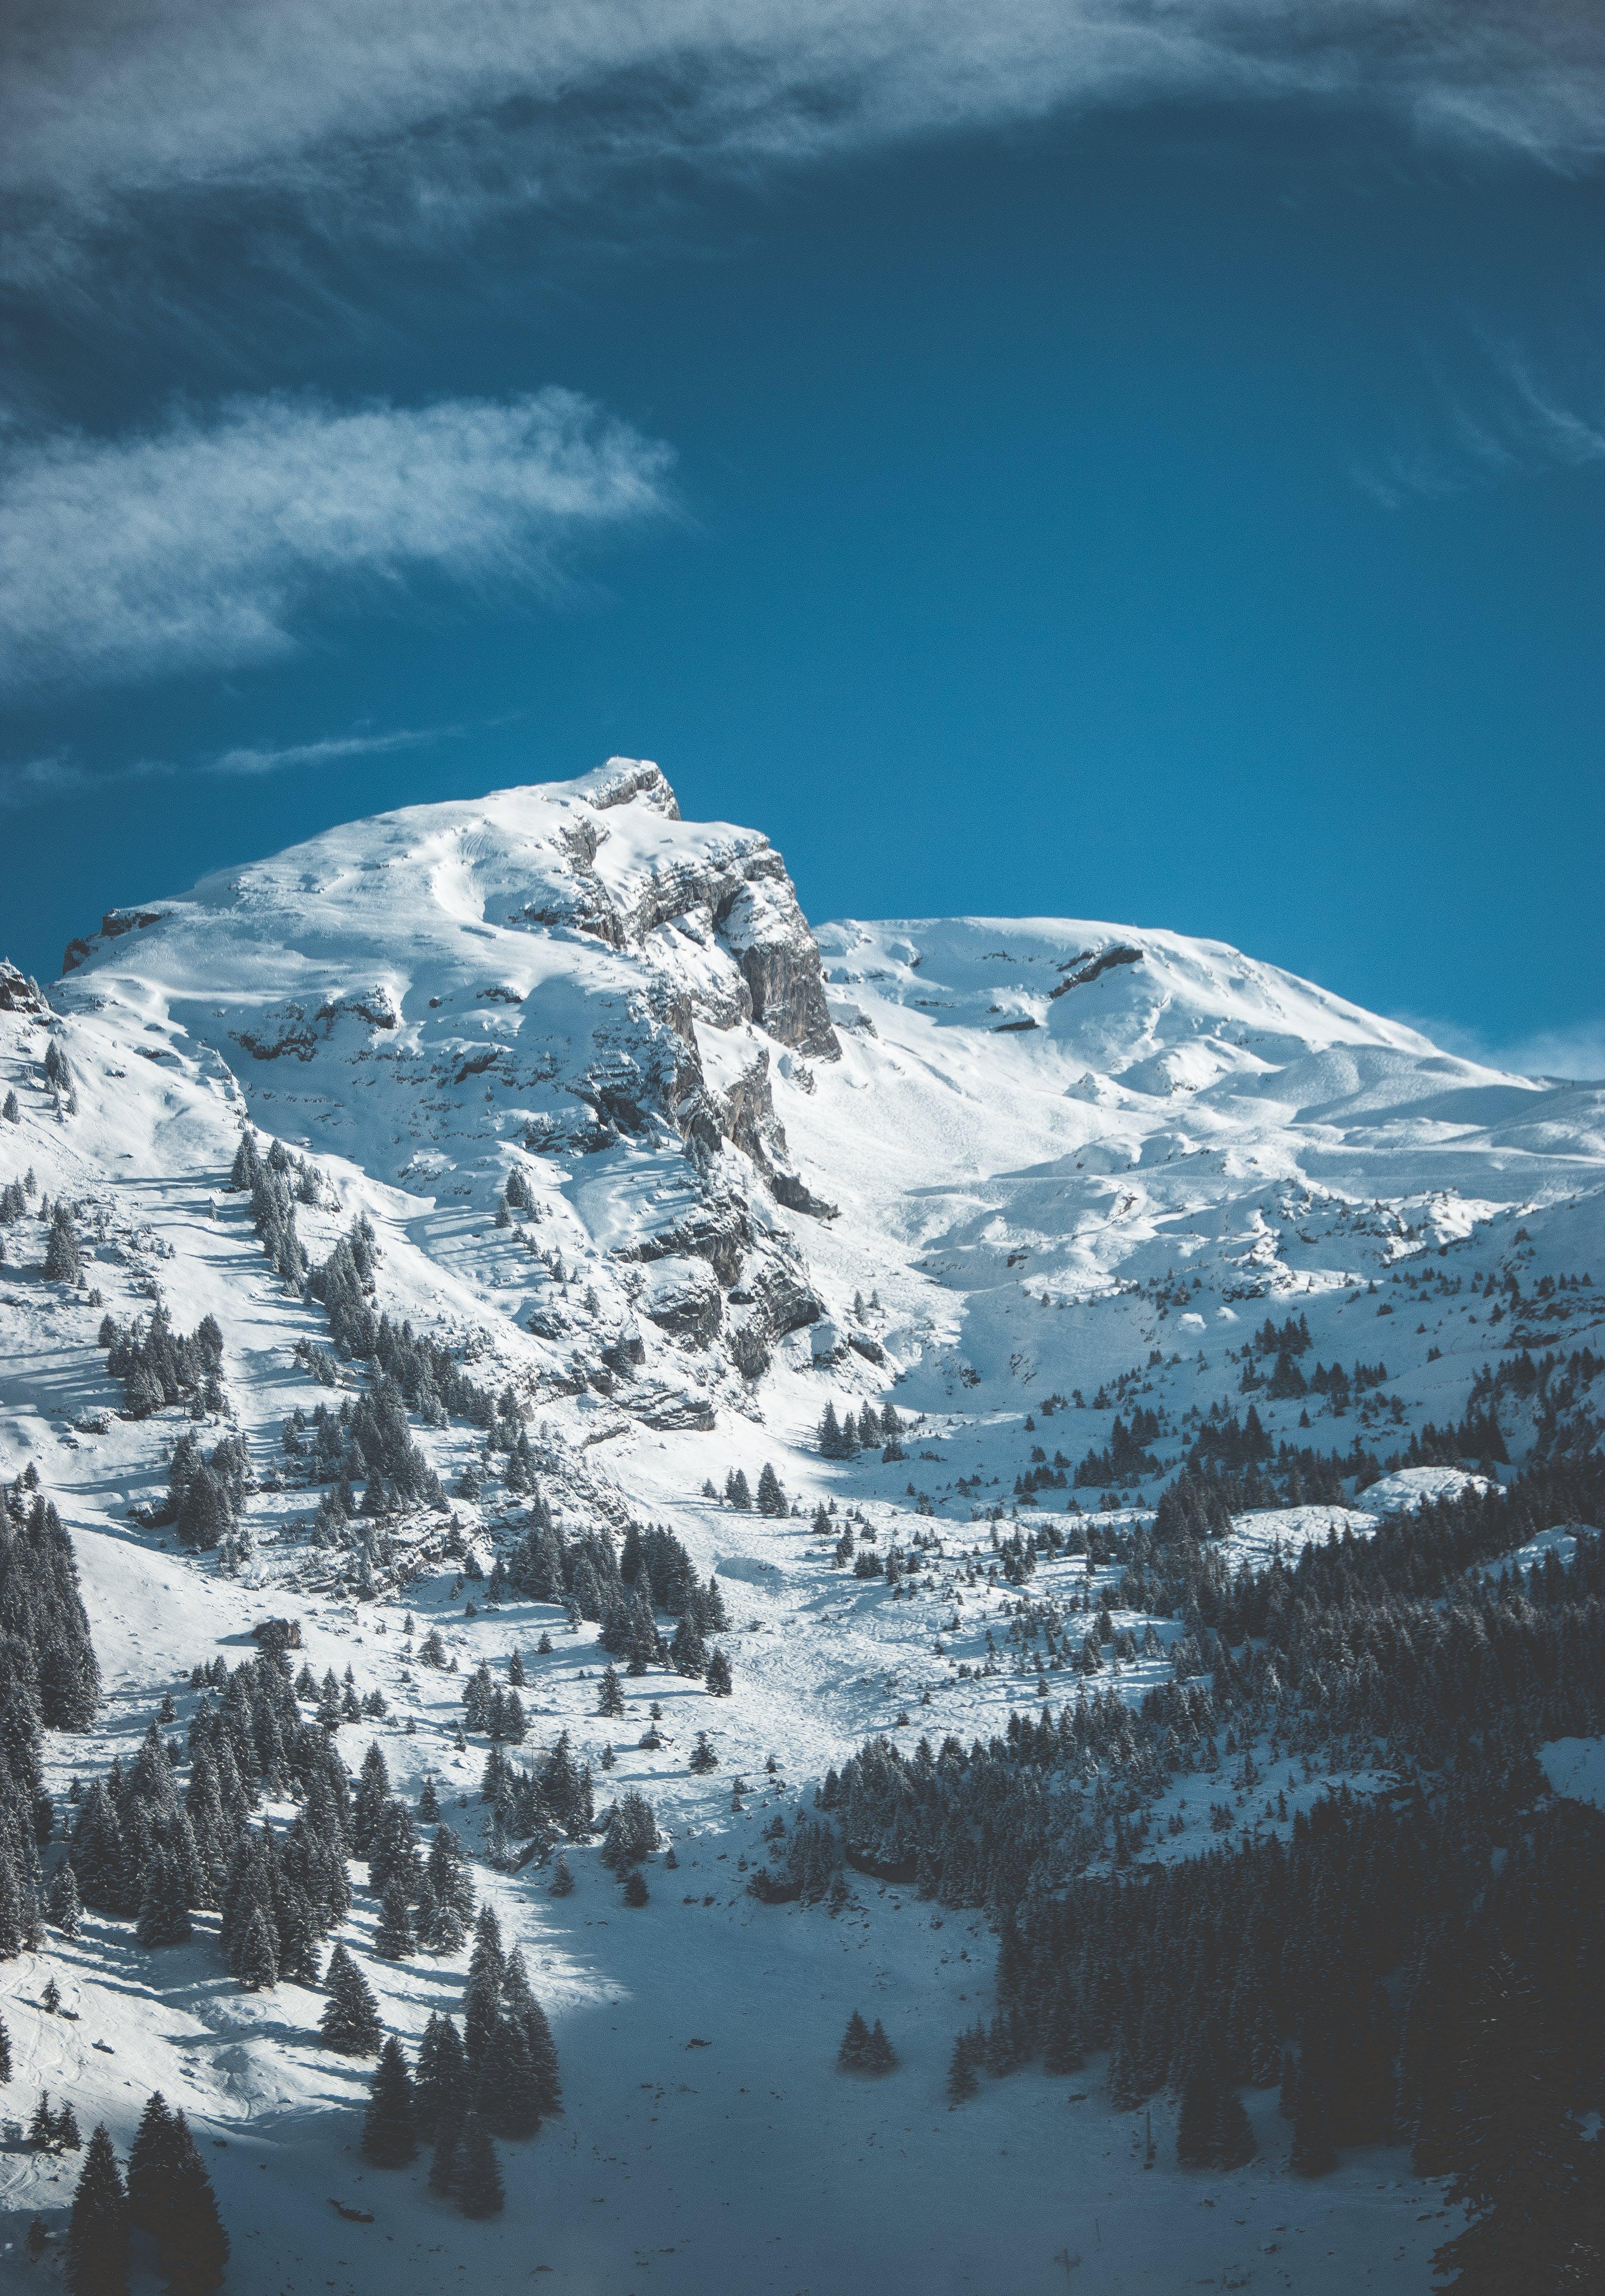 Kostenloses Stock Foto zu alpen, bäume, berg, blauer himmel